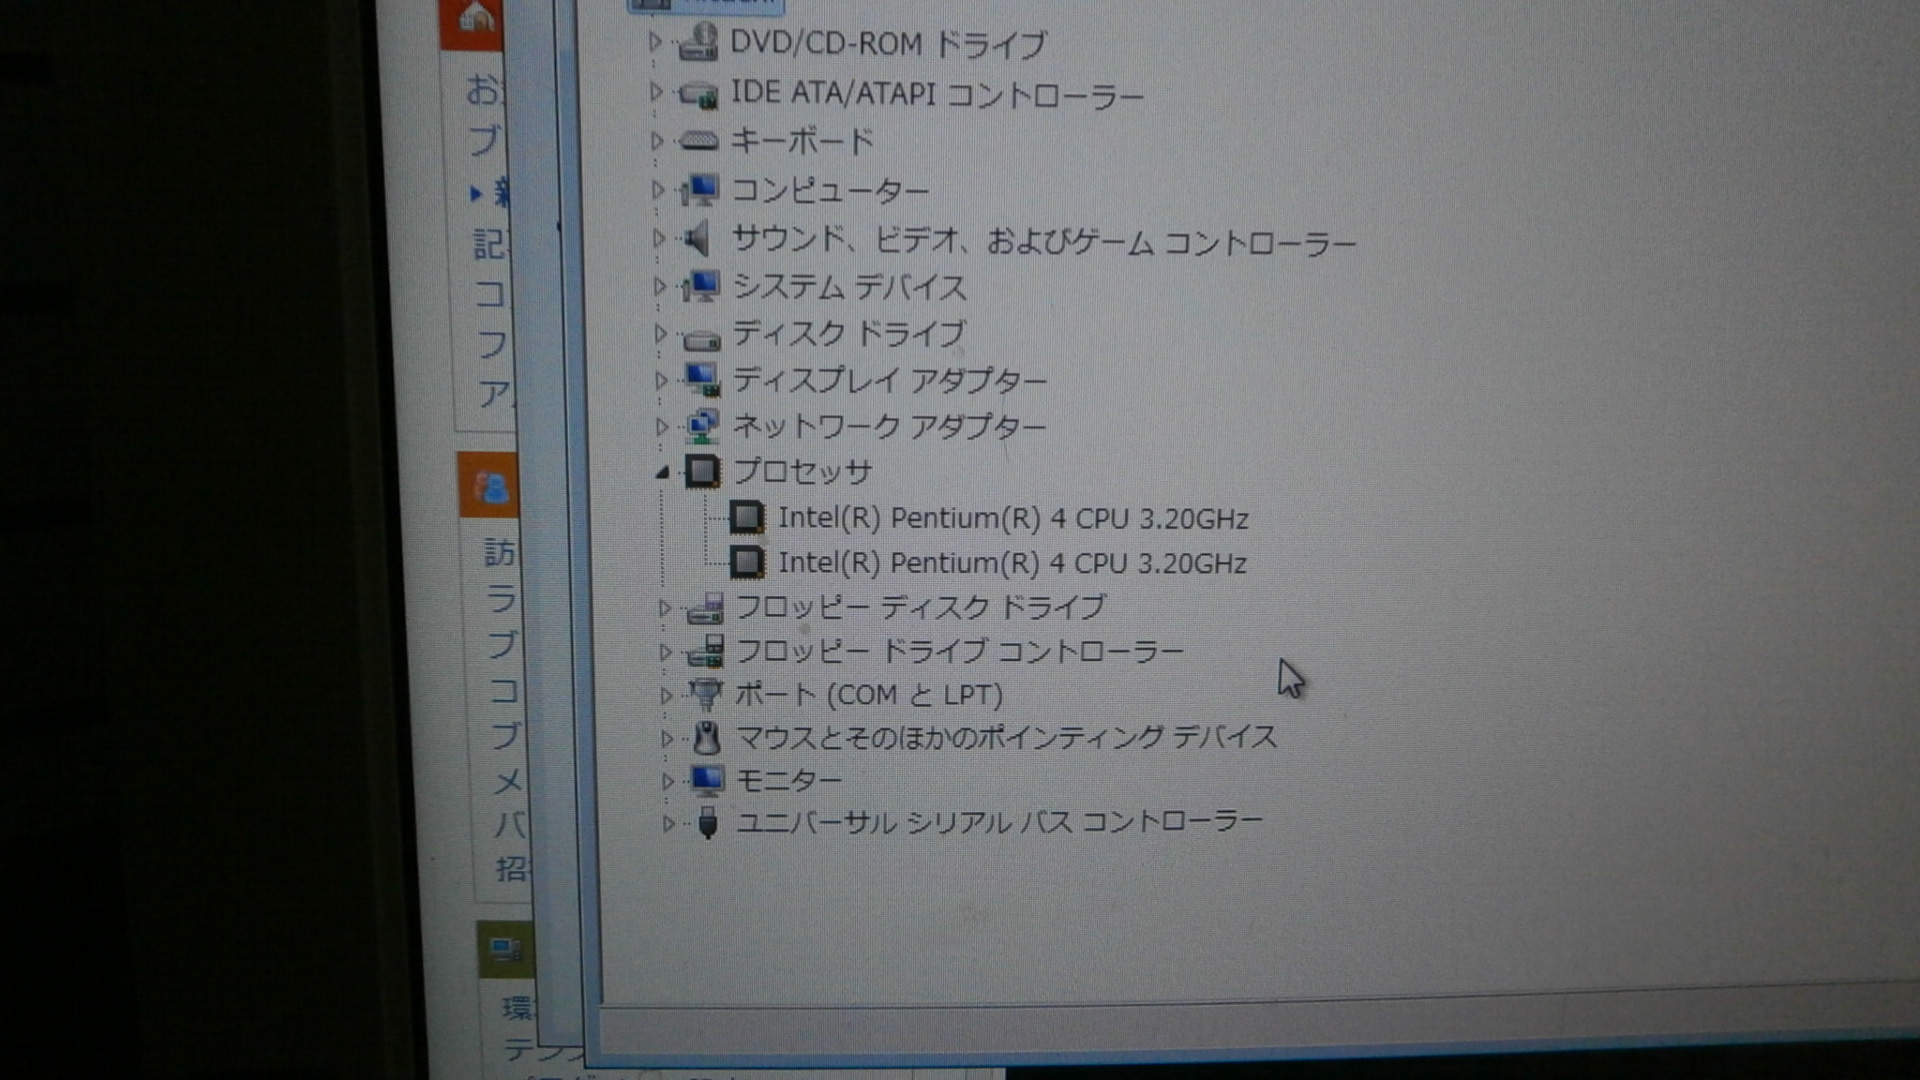 PC270001_1.jpg